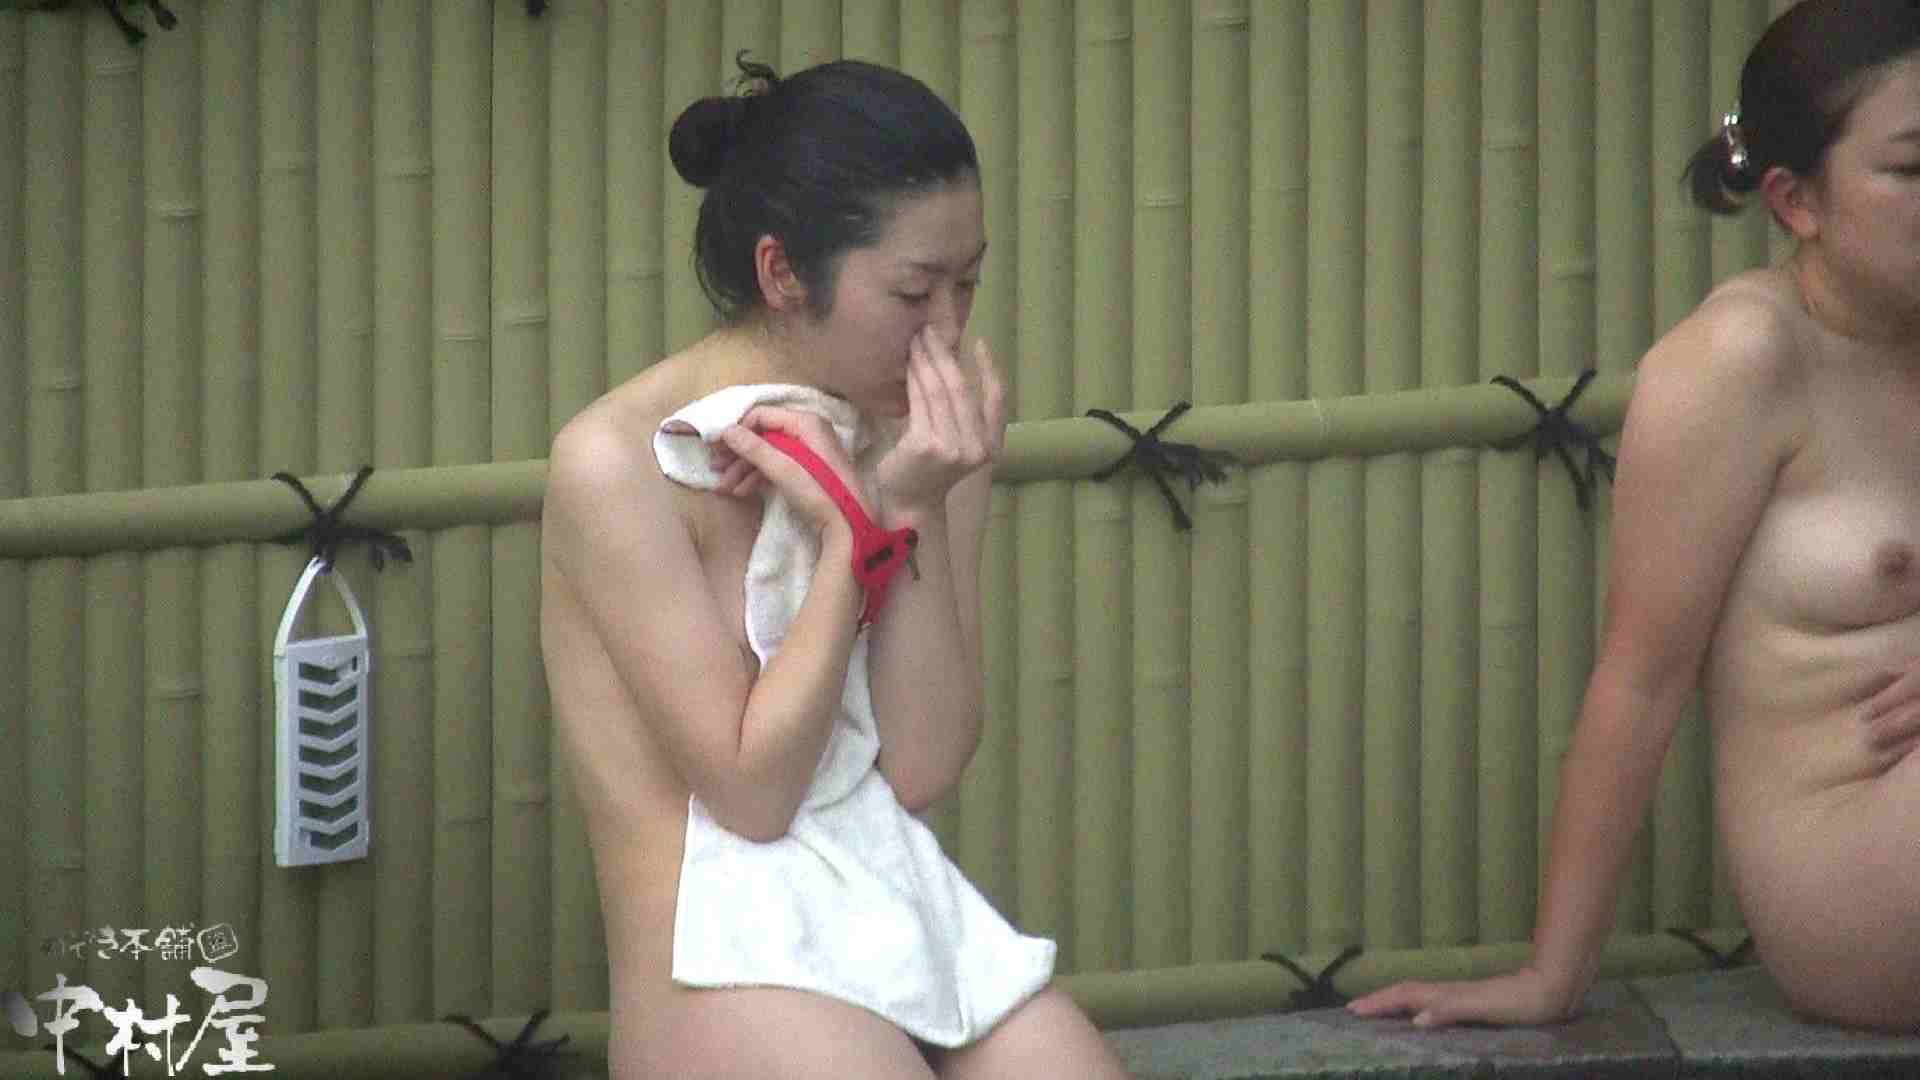 Aquaな露天風呂Vol.917 OLセックス   盗撮  102画像 88